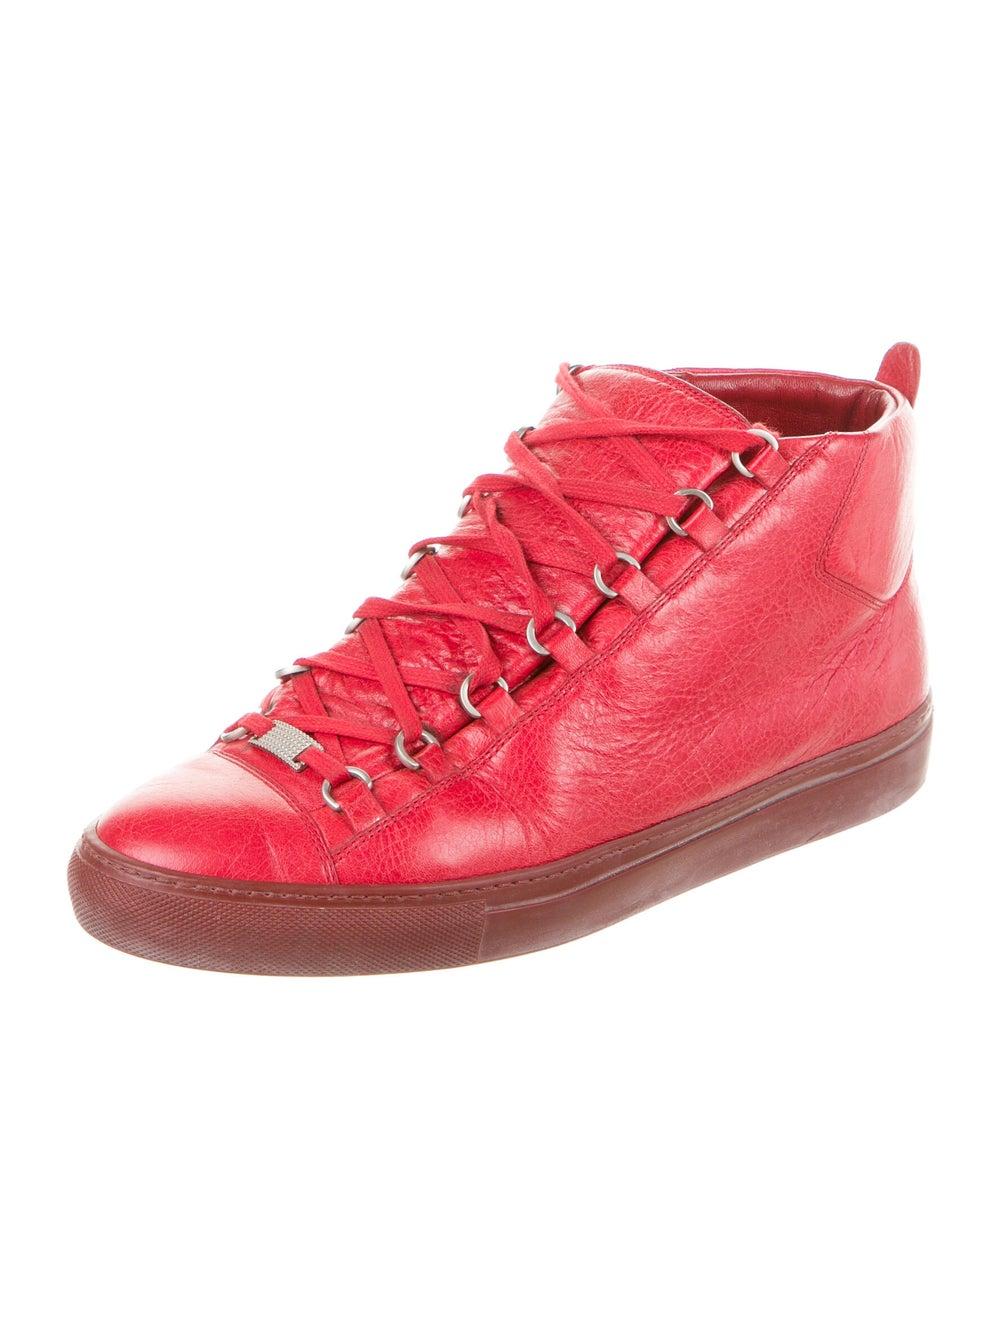 Balenciaga Arena Sneakers Sneakers Red - image 2